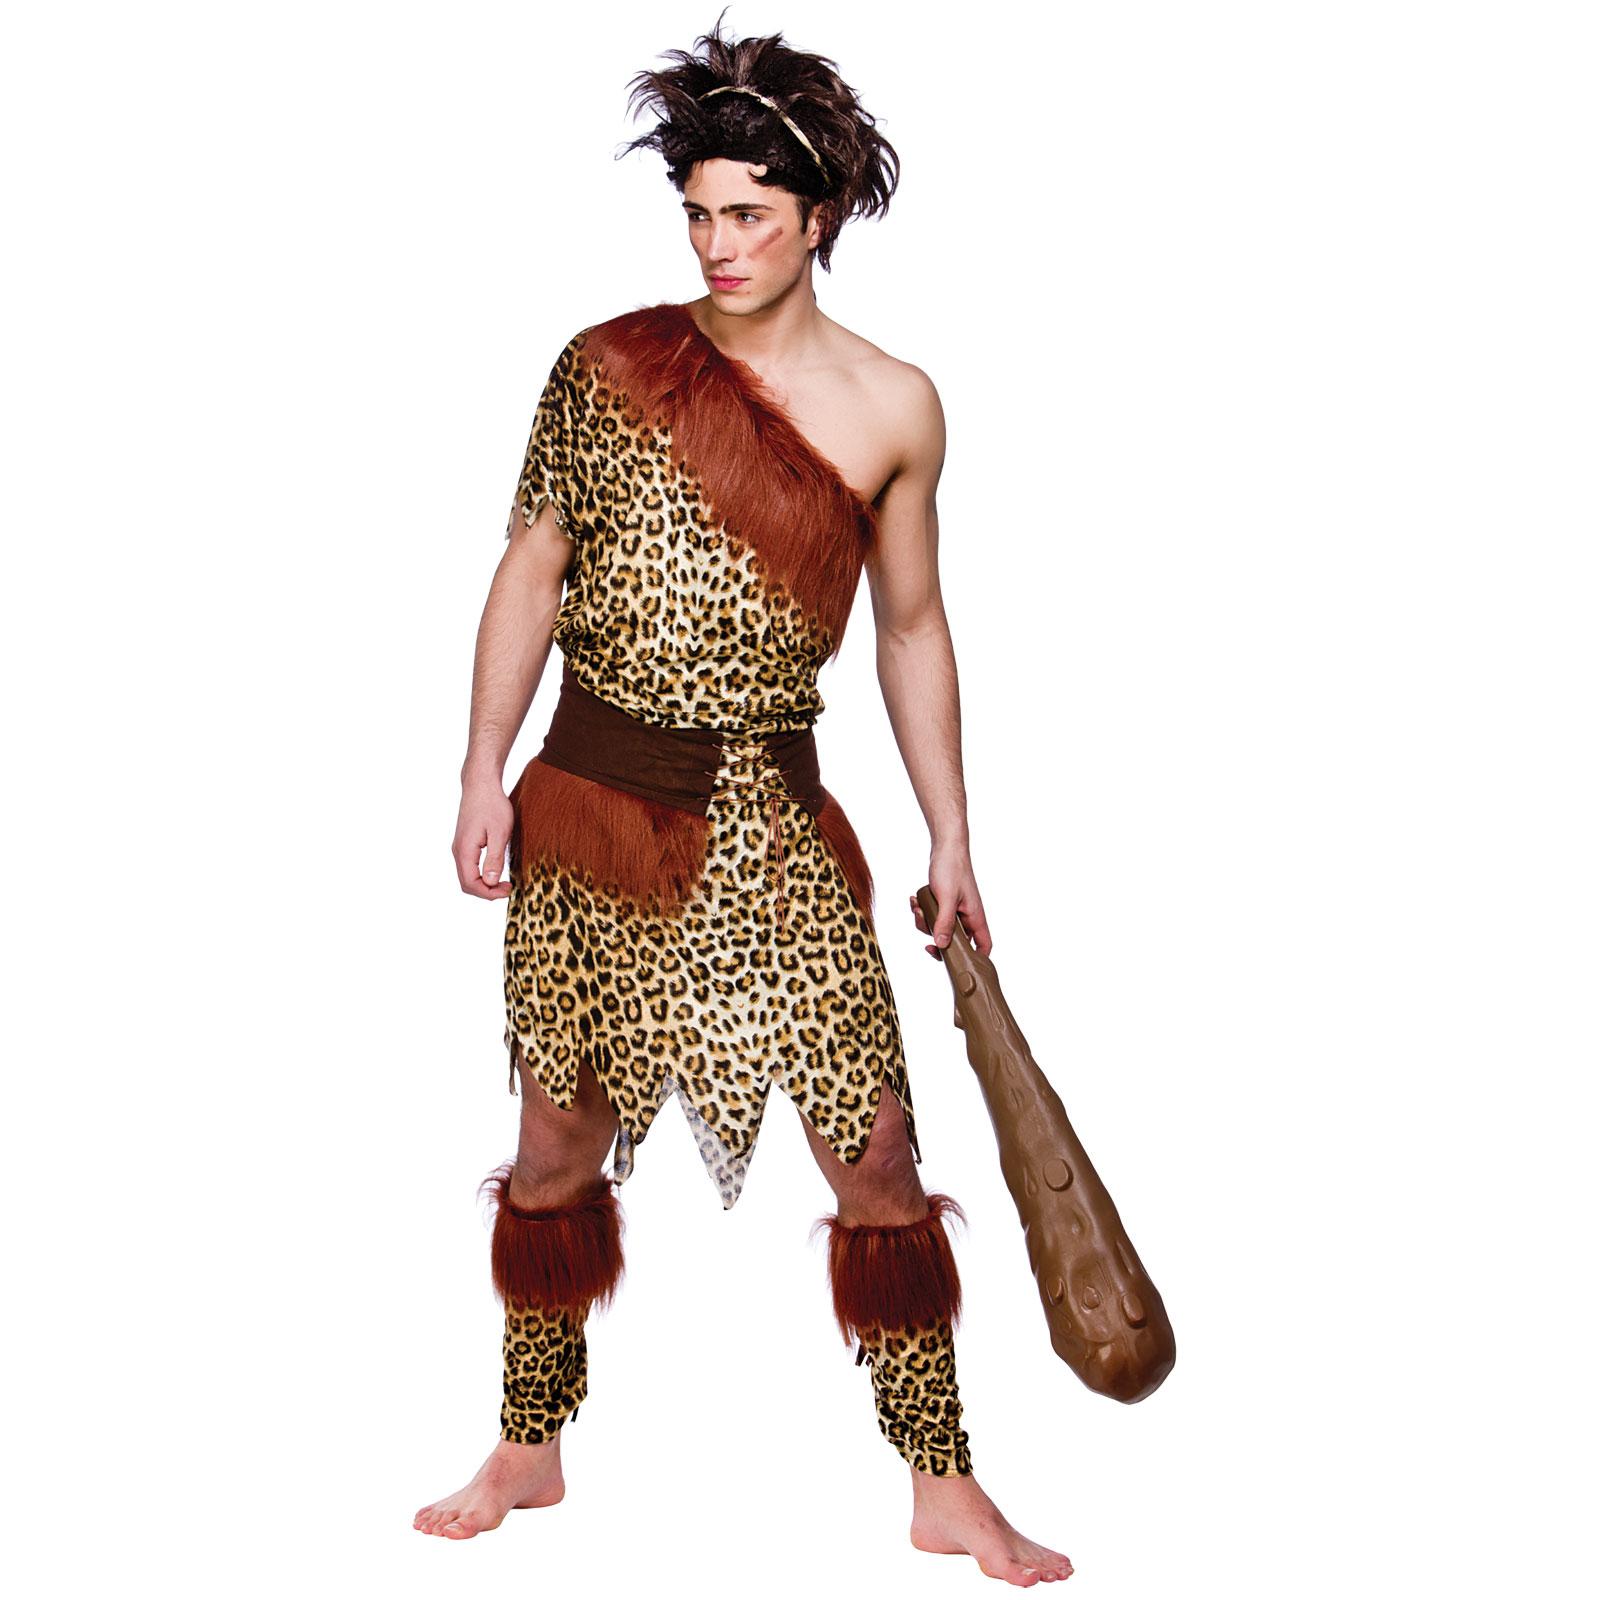 Caveman Style : Stoneage caveman prehistoric jungle tv film fancy dress up